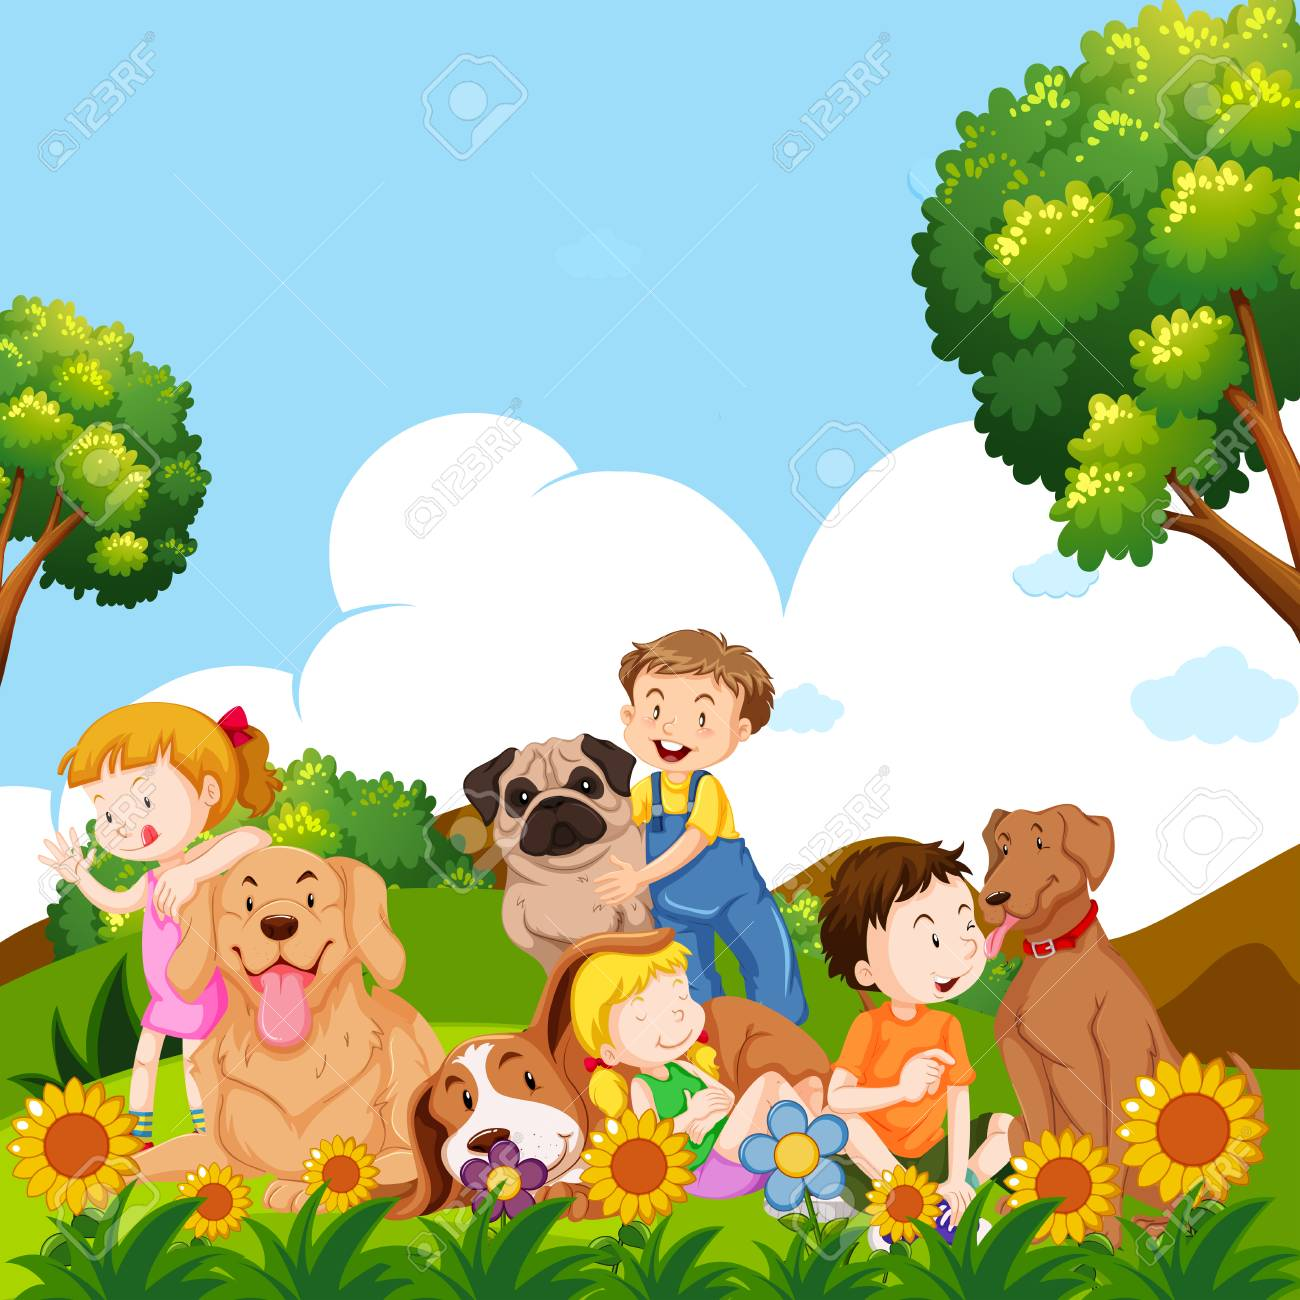 Children and pet dogs in garden illustration.